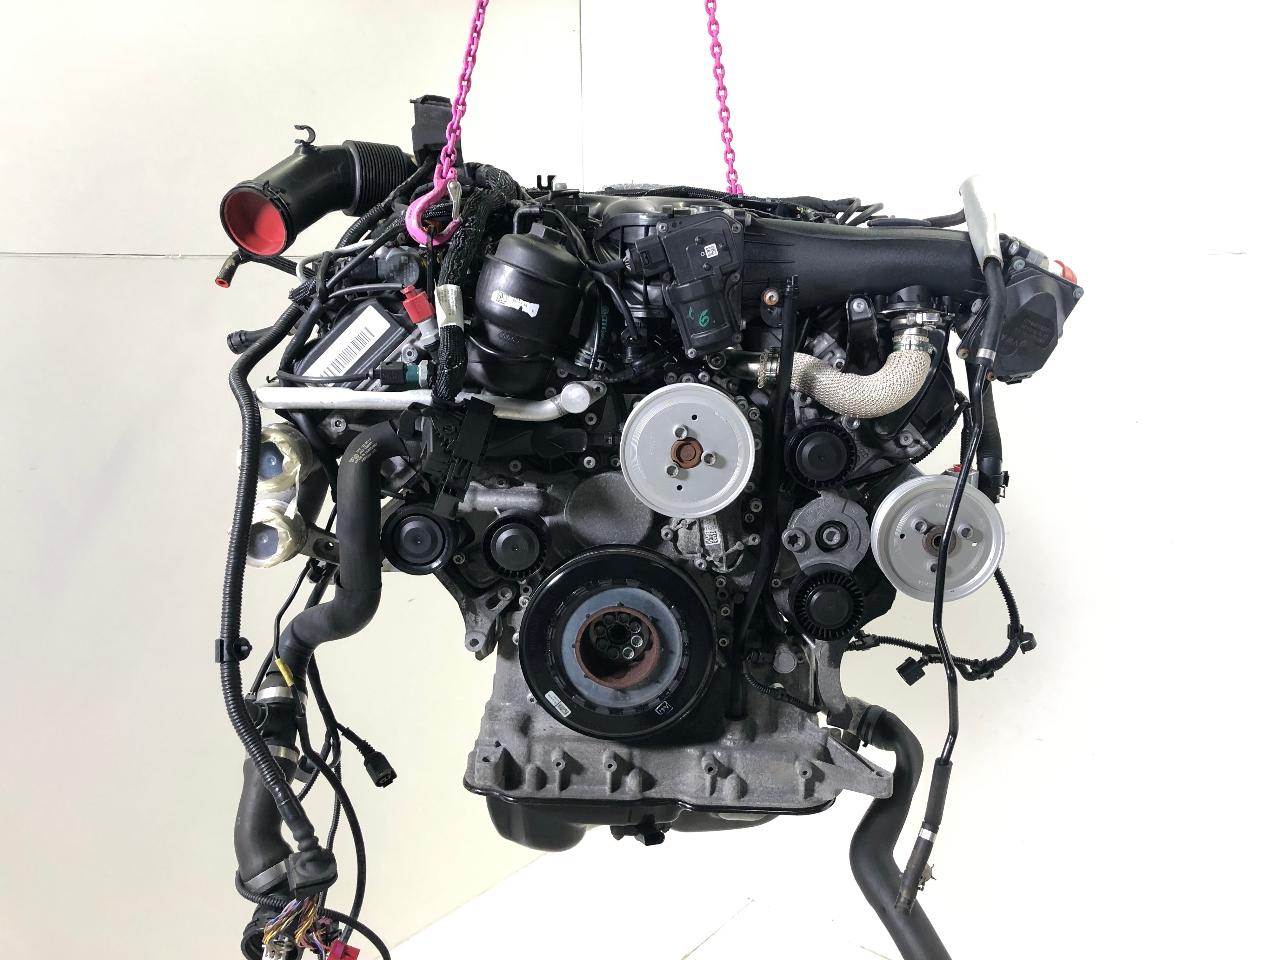 Volkswagen Touareg 3.0 V6 TDI 2011-2016 Fuel Cabin Air Oil Filters Complete Kit